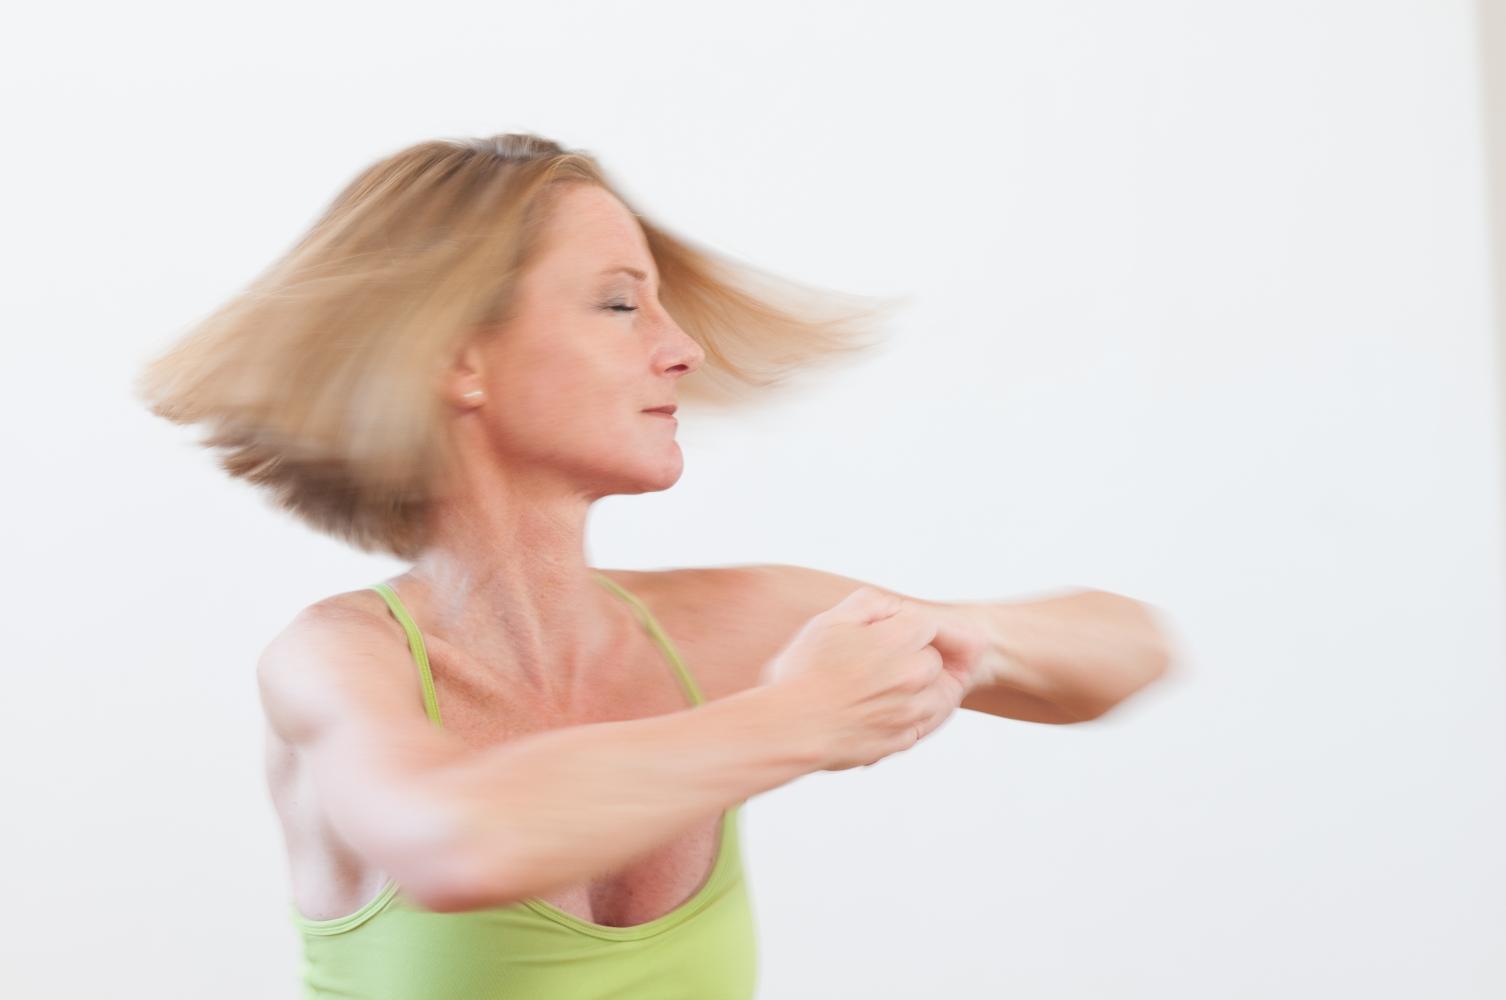 hormon yoga fliegende haare dynamisch 1